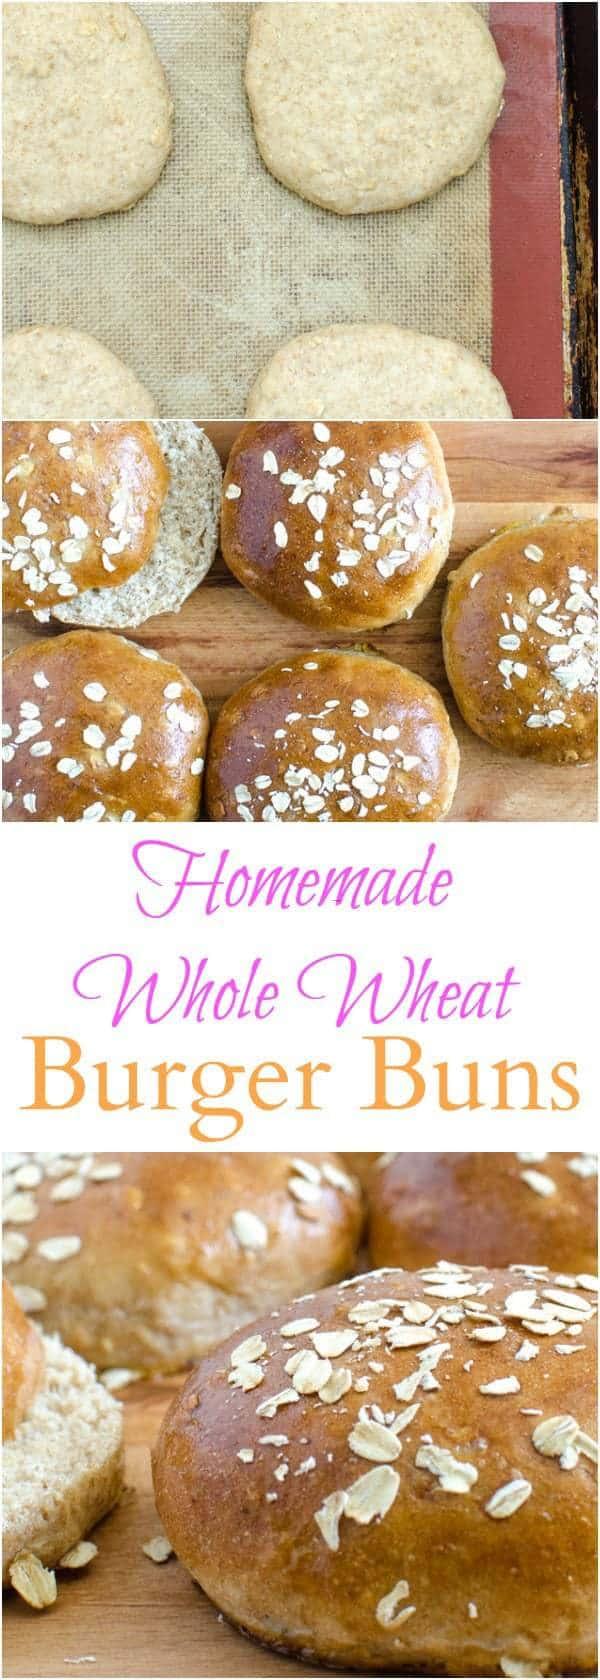 Homemade Whole Wheat hamburger bun recipe that tastes amazing!